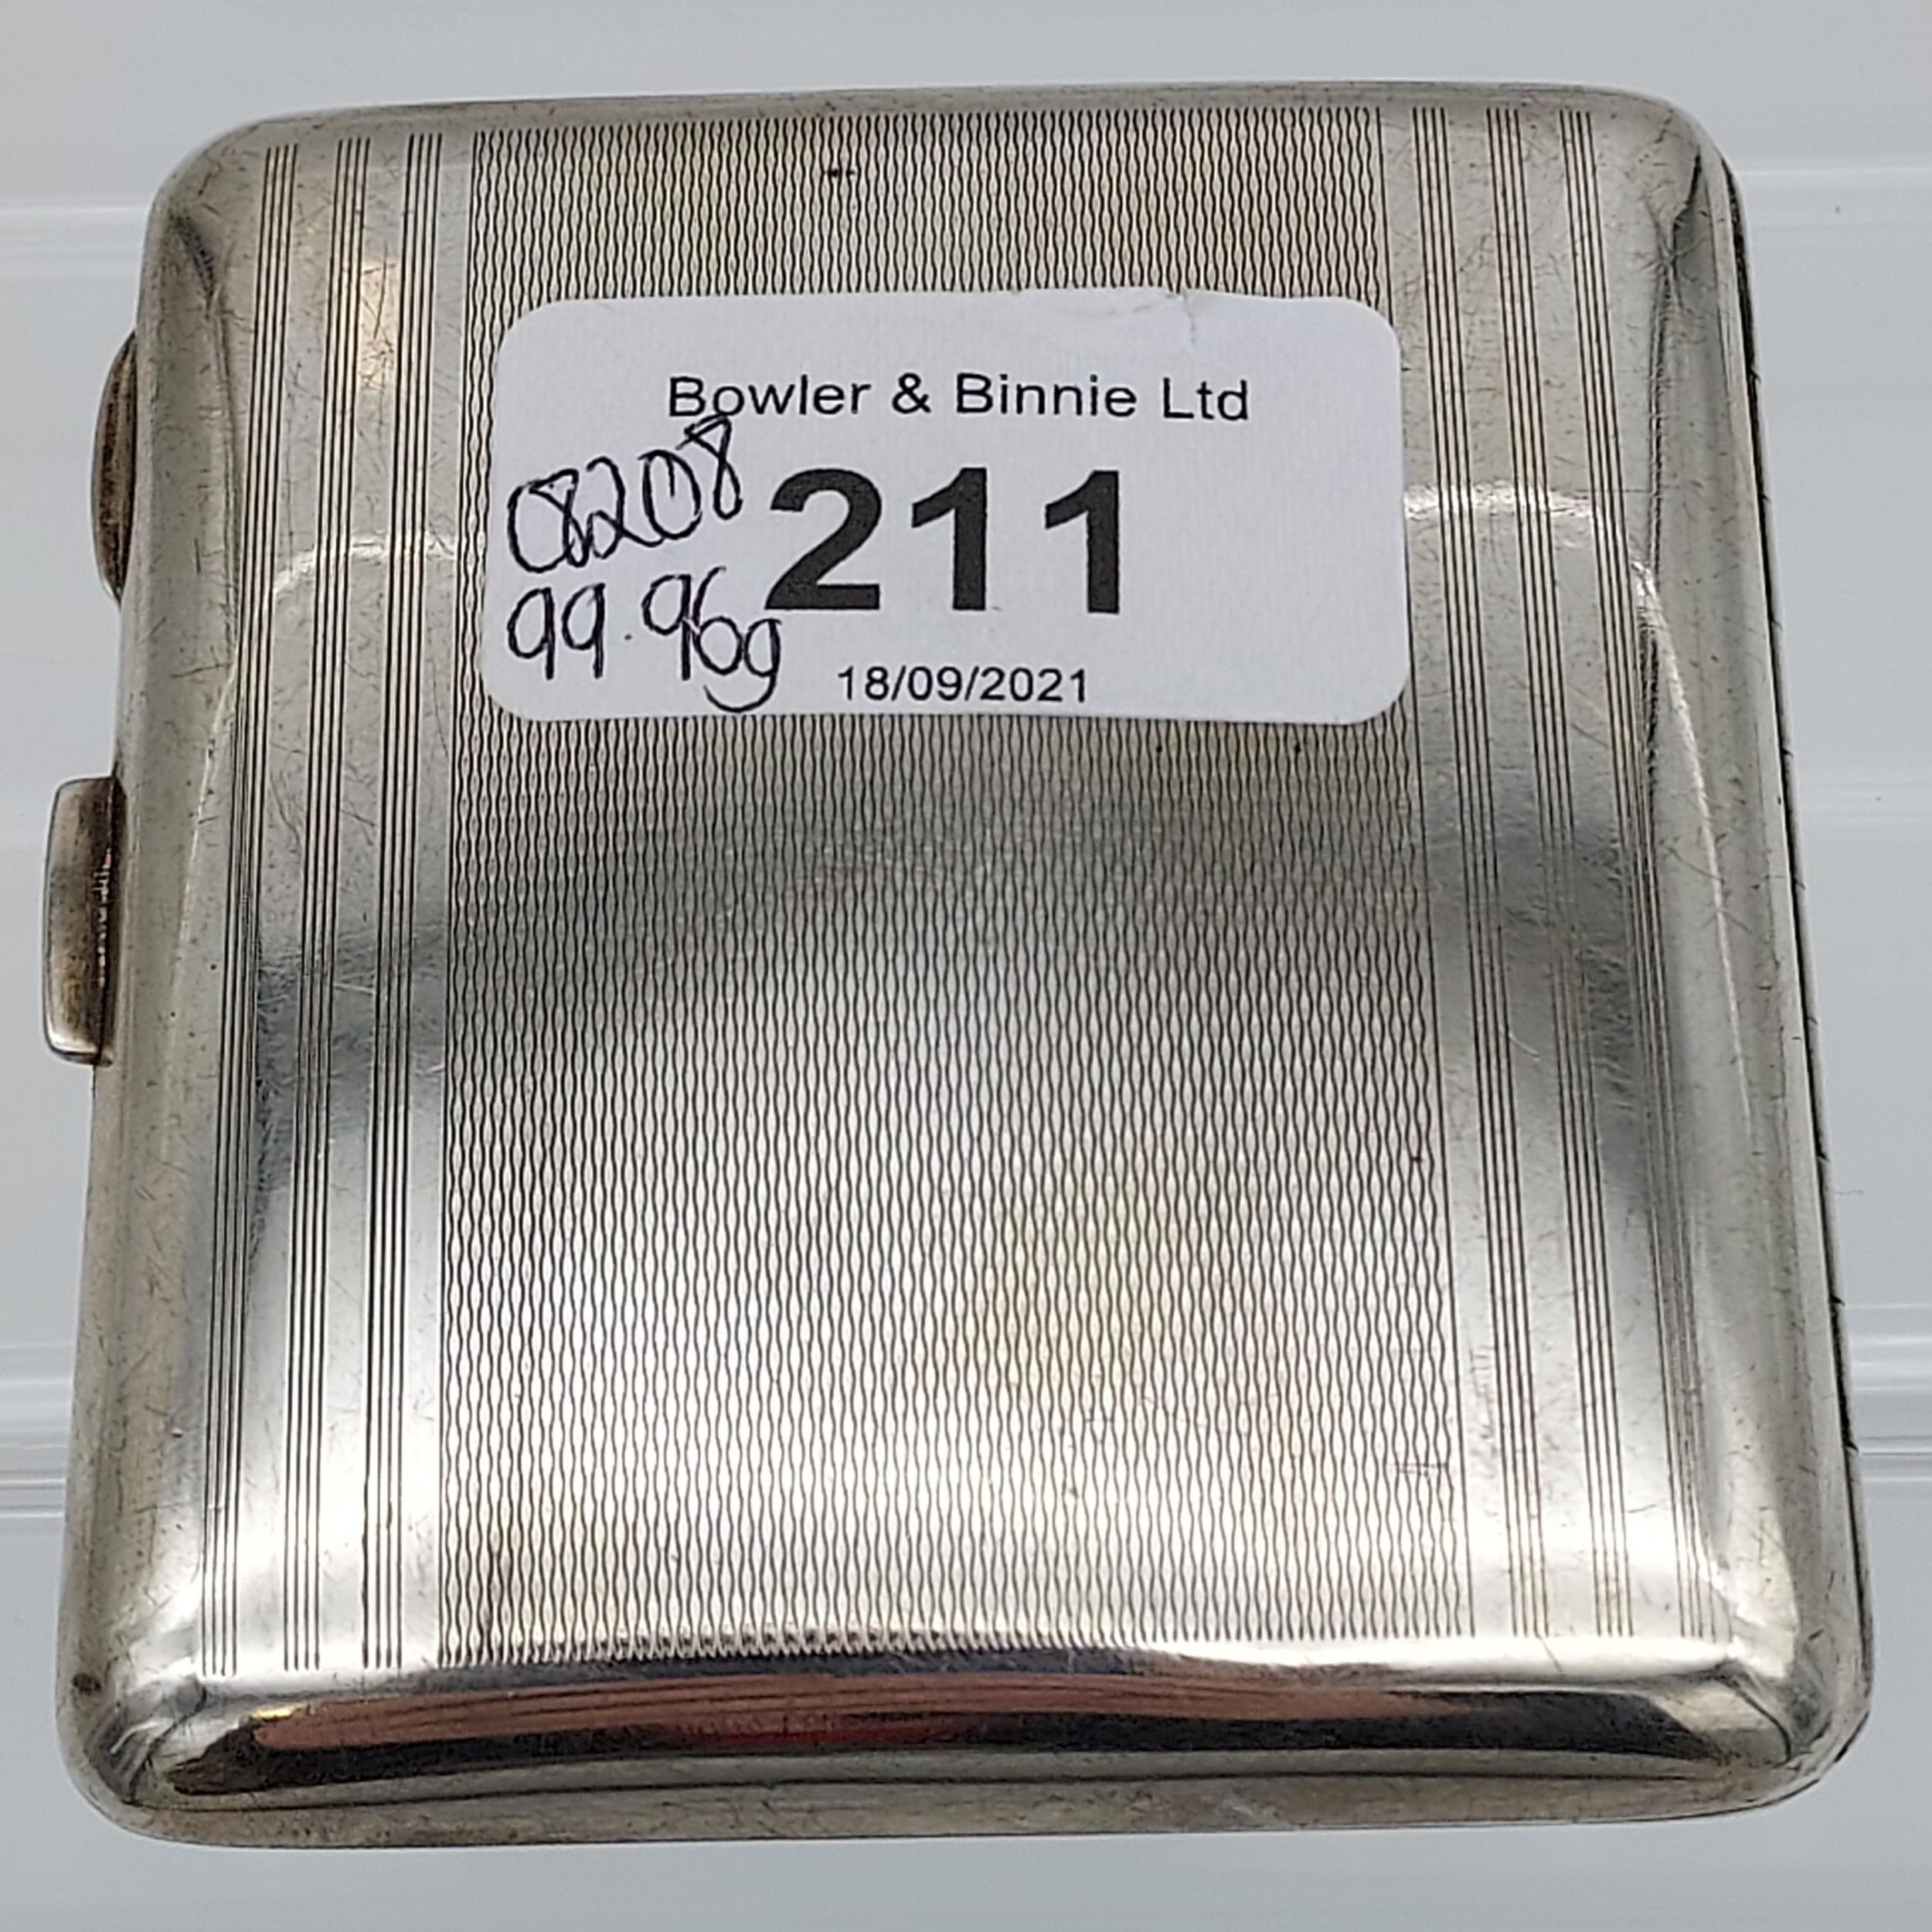 A Birmingham silver Art Deco design cigarette case [99.96grams] - Image 4 of 5